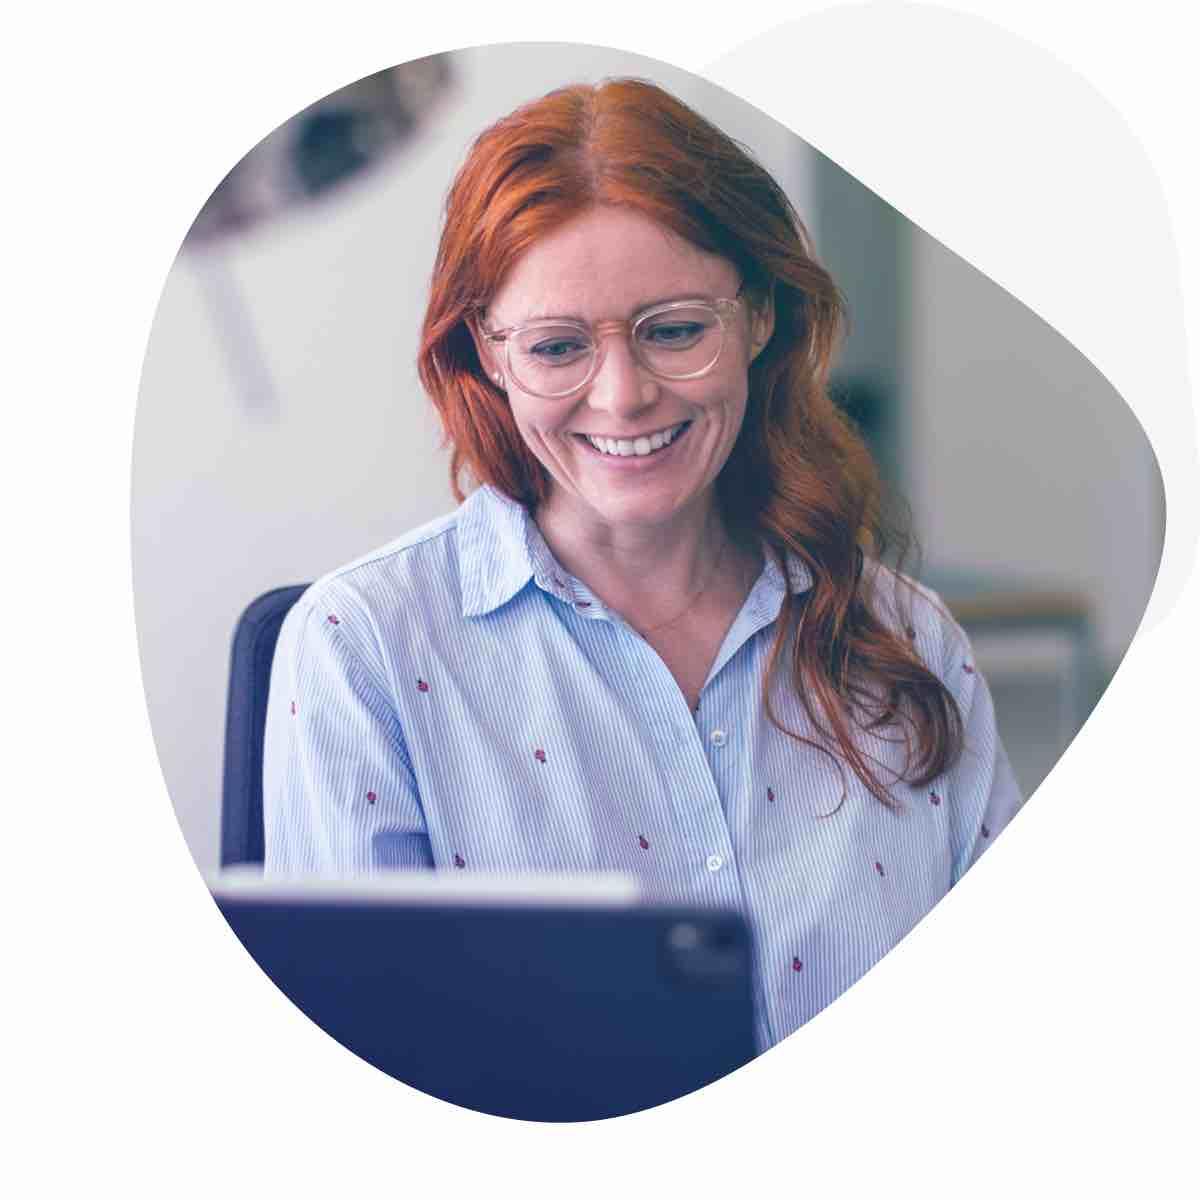 Digitale Personalakte - Haufe HR Software